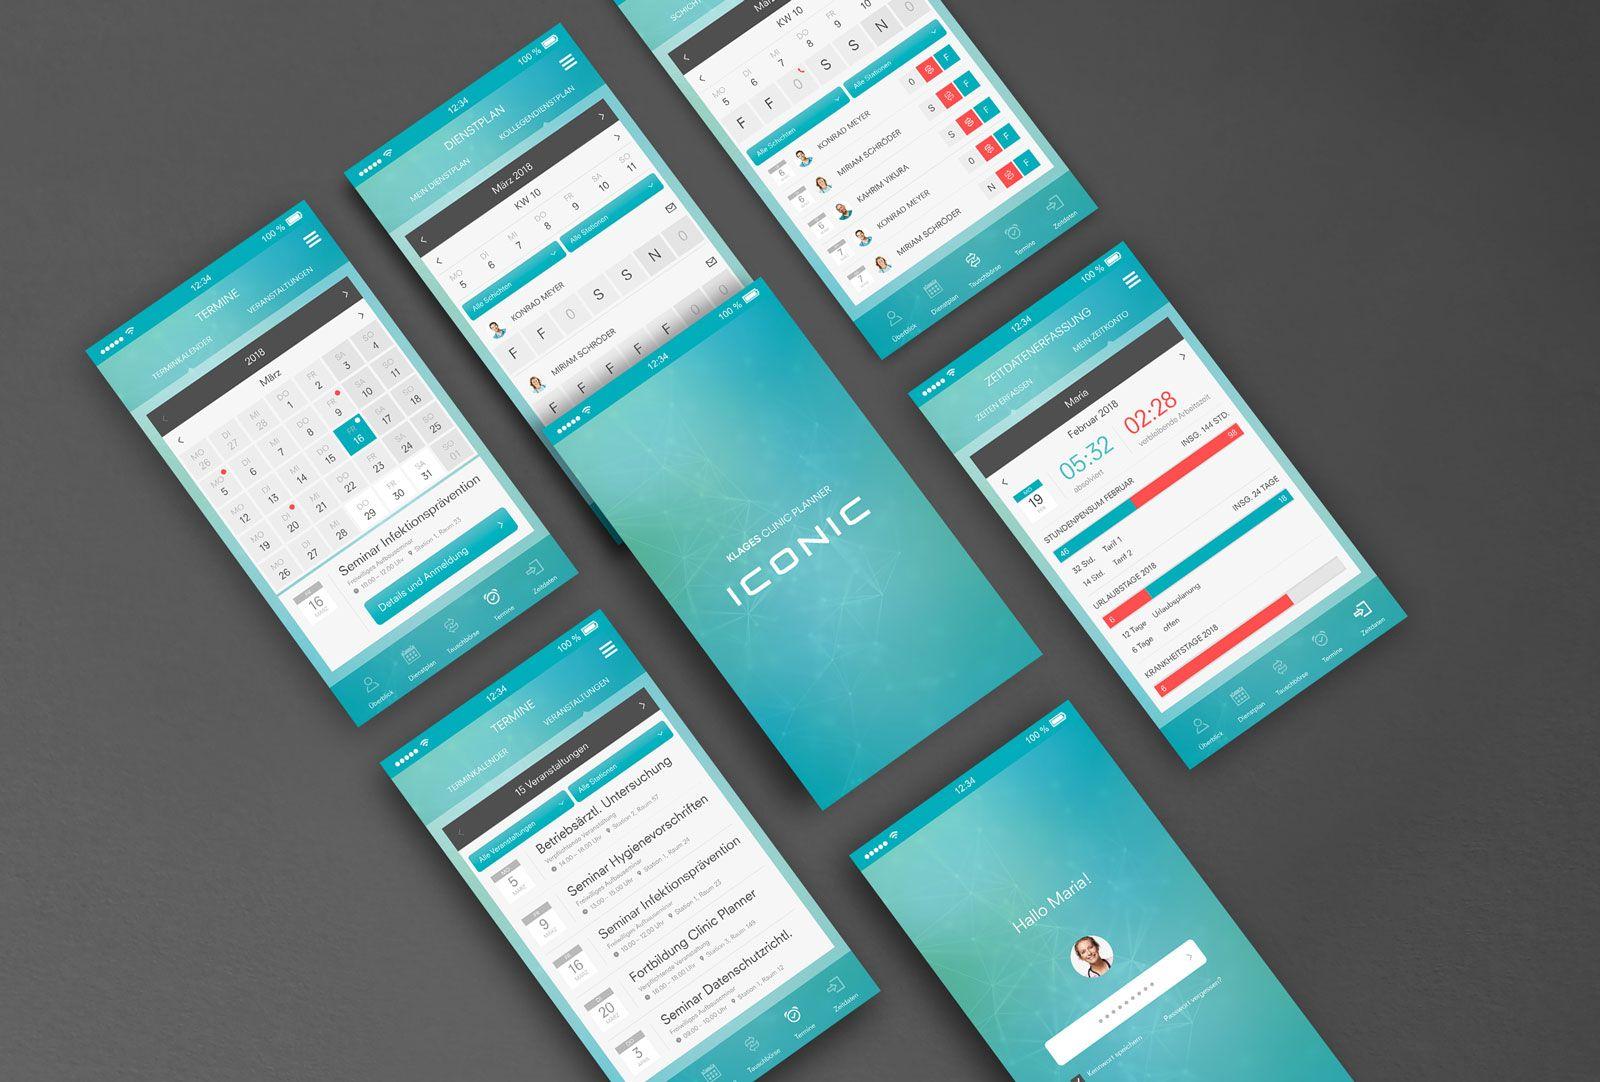 KLAGES & Partner - Clinic Planner App